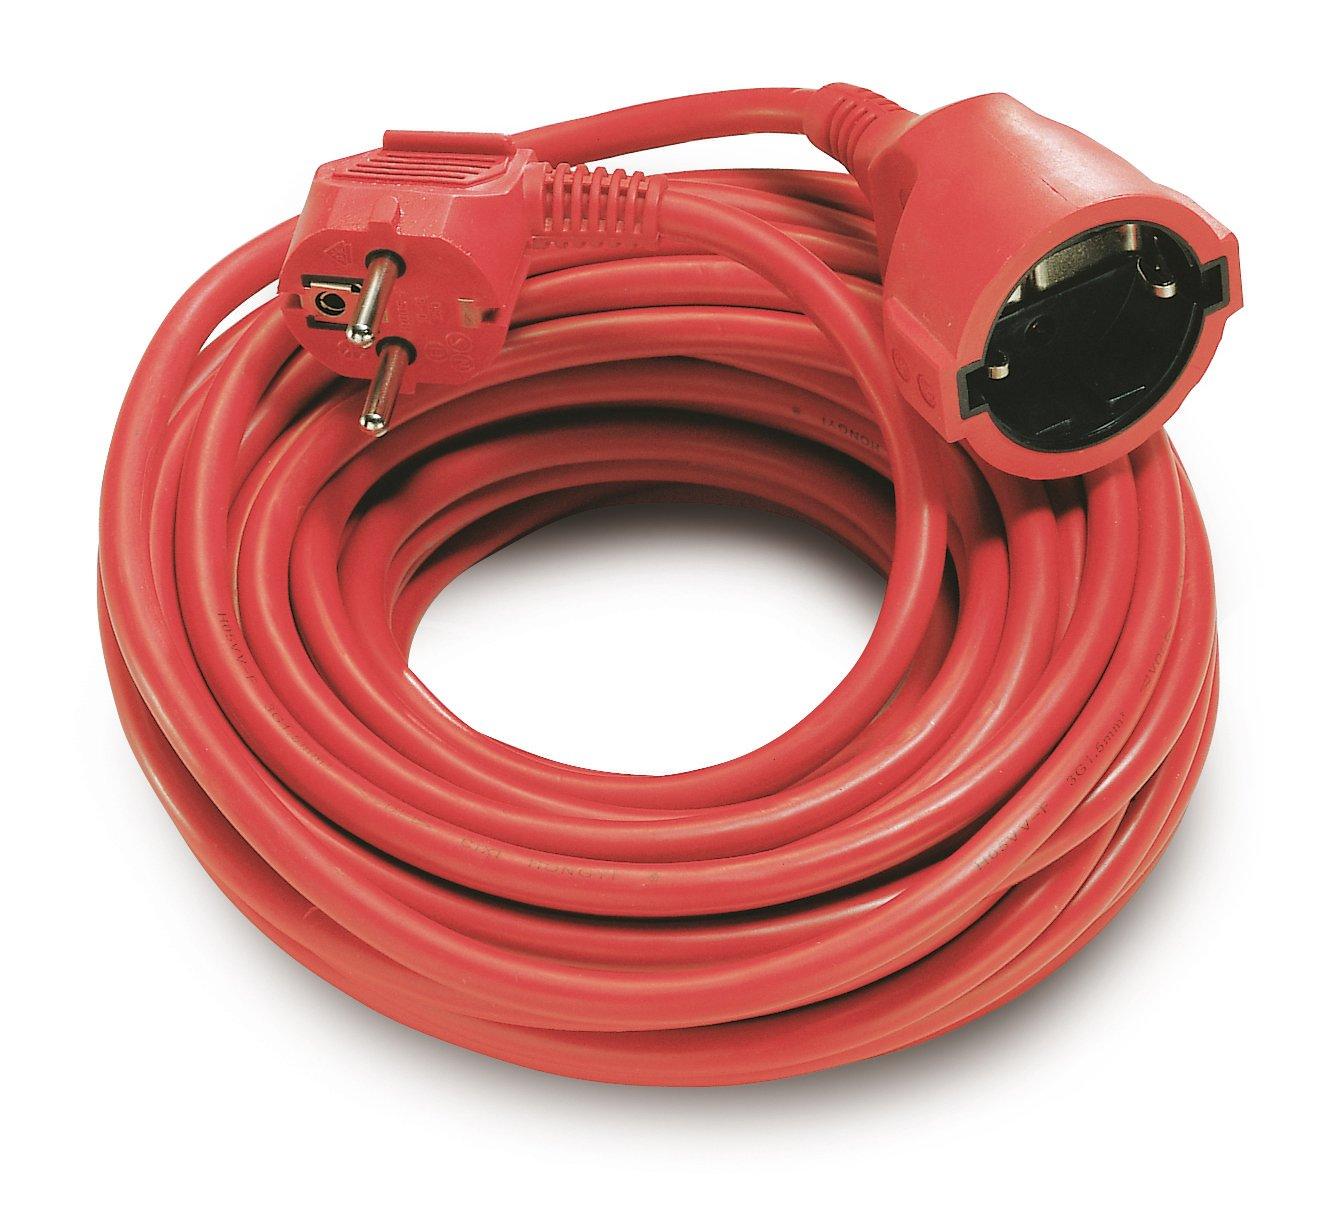 Tayg Prolongador eléctrico m x